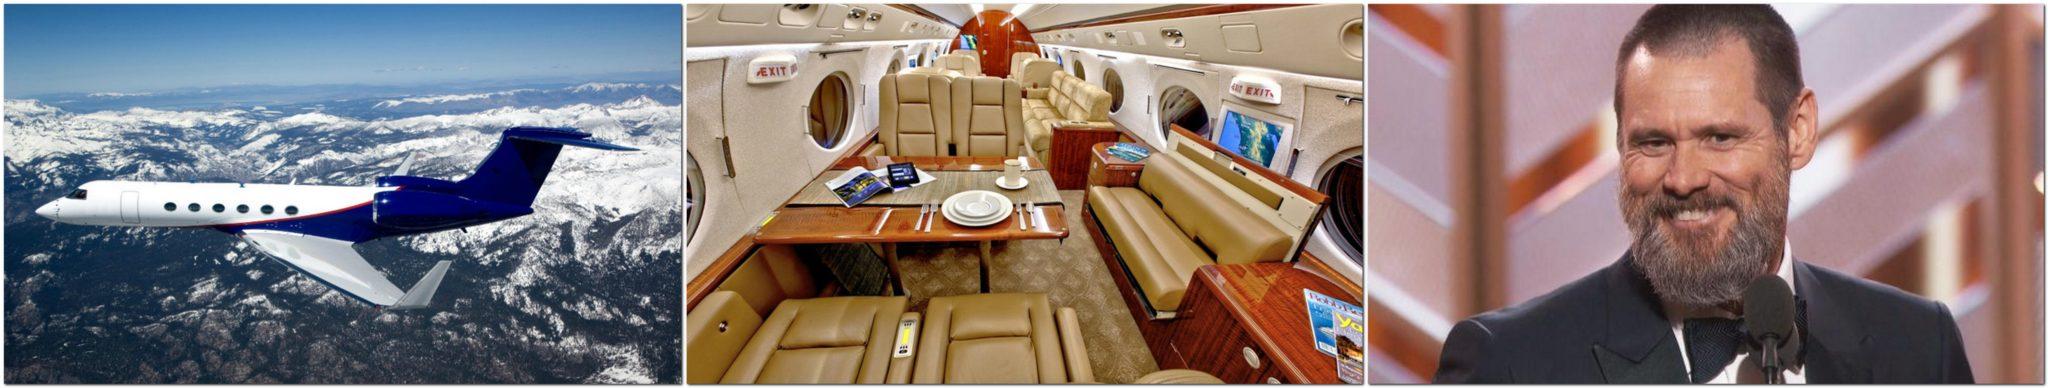 Jim Carrey Gulfstream V